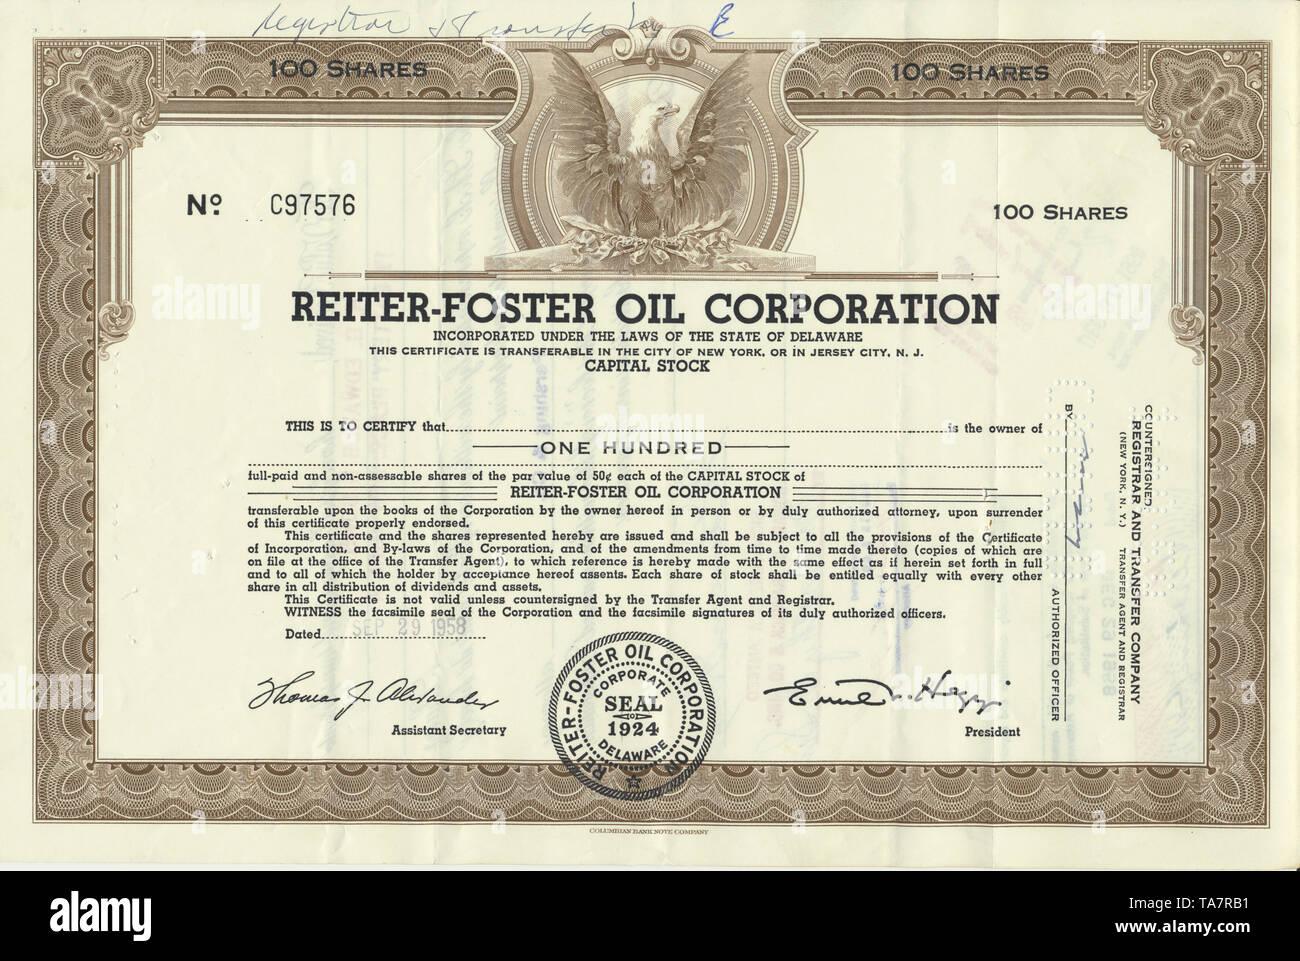 Historical stock certificate of an oil and gas company, Reiter-Foster Oil Corporation, Delaware, USA, 1958, Wertpapier, historische Aktie, Mineralöl- und Erdgasunternehmen, Reiter-Foster Oil Corporation, 1958, Delaware, USA - Stock Image